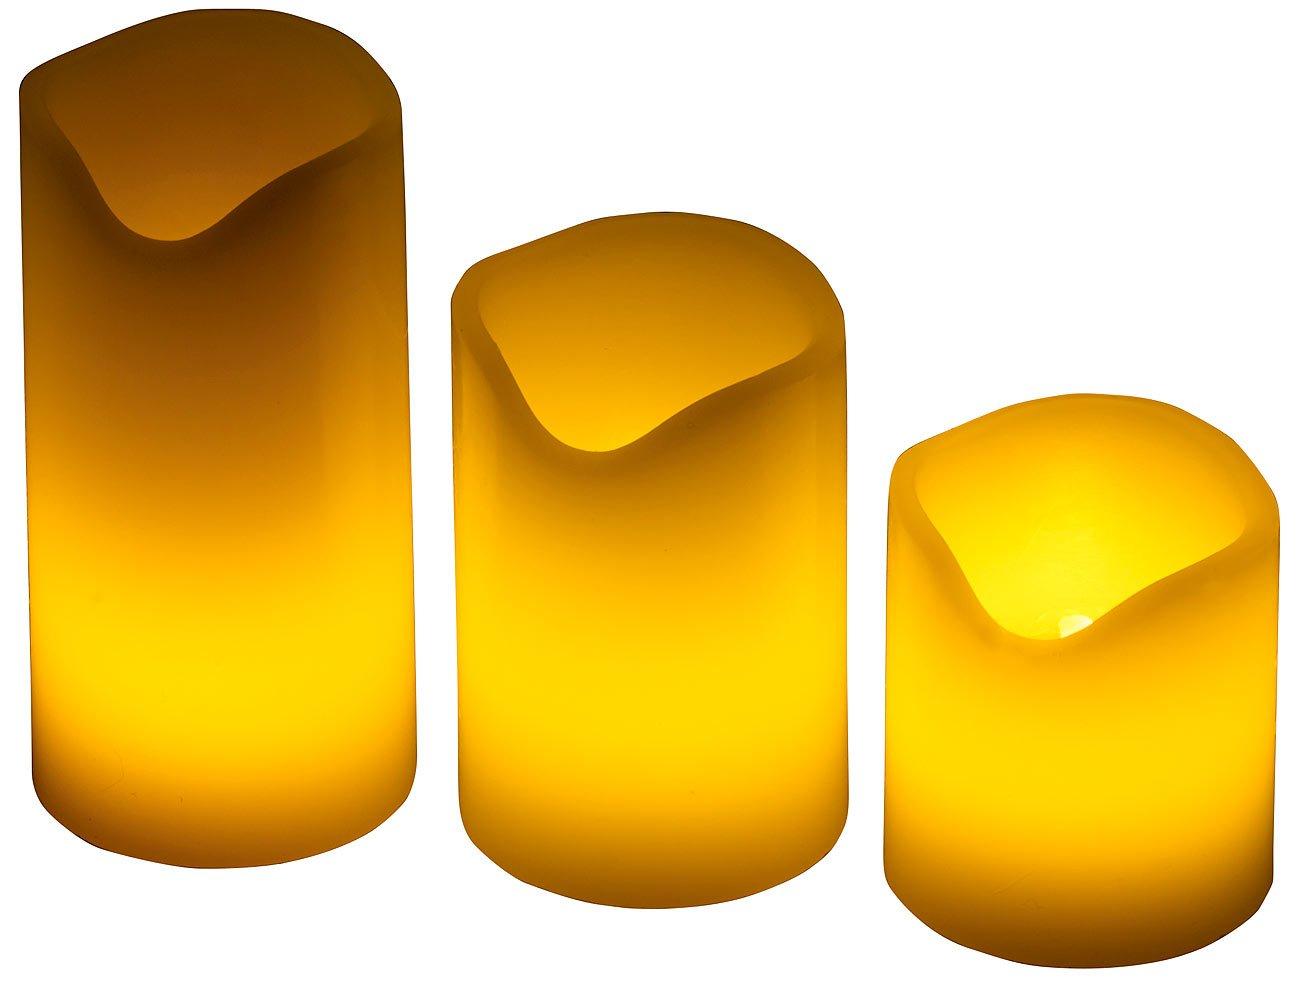 PEARL LED Kerzen mit Timer: 3er-Set LED-Kerzen, Echtwachs-Mantel, Flacker-Flamme, Batteriebetrieb (LED-Kerzen Wachs)